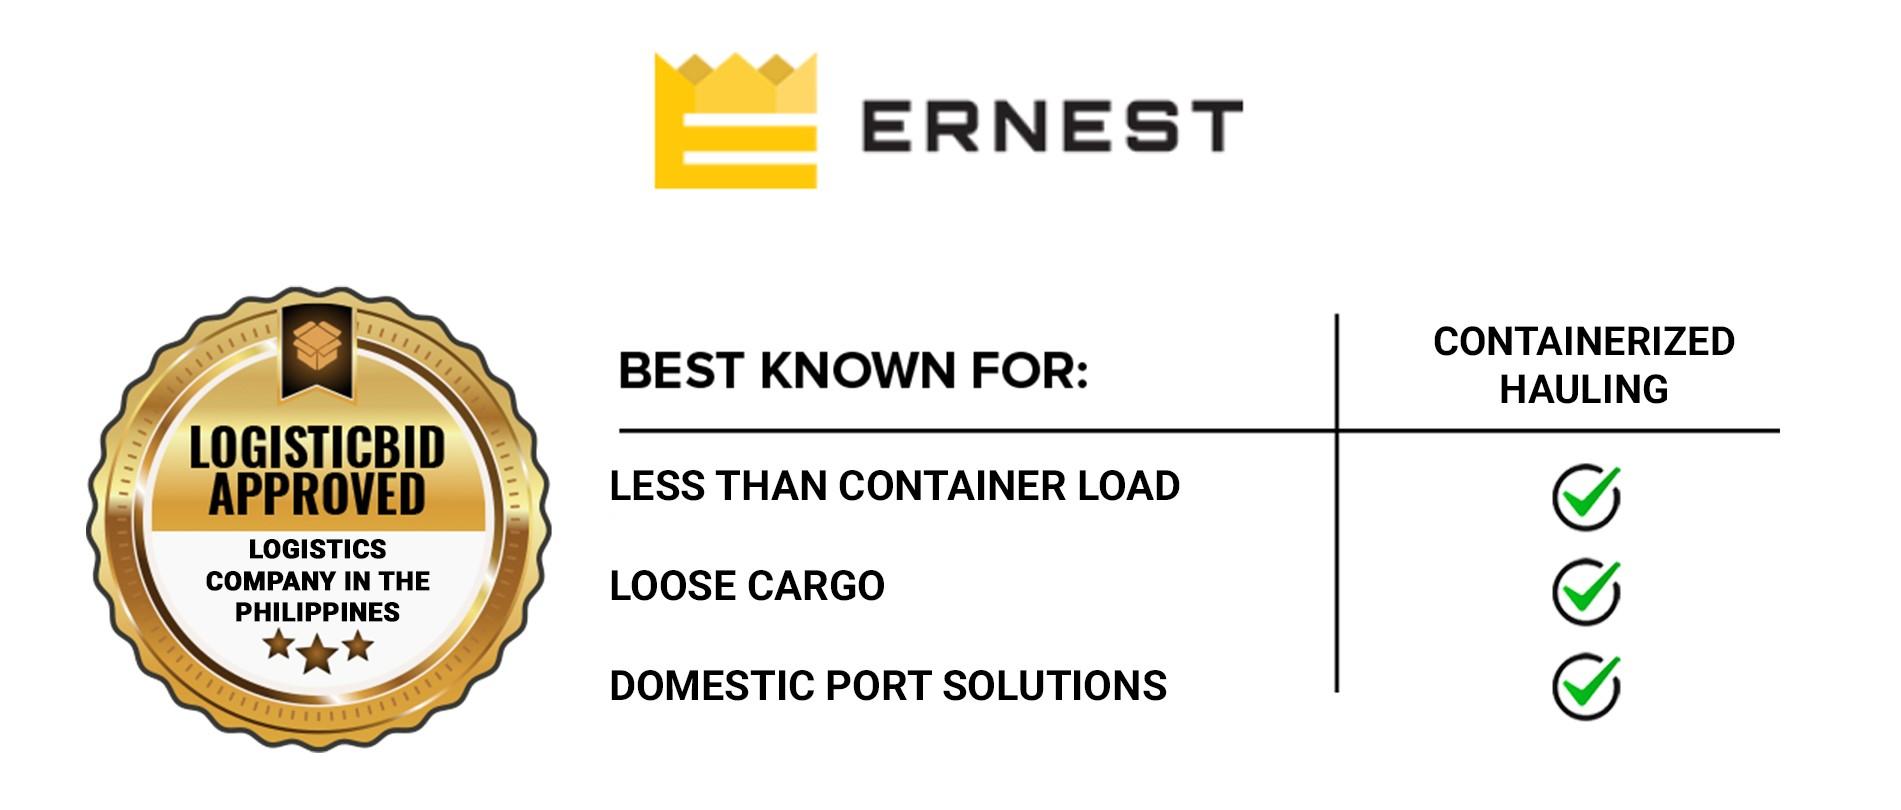 Ernest Logistics